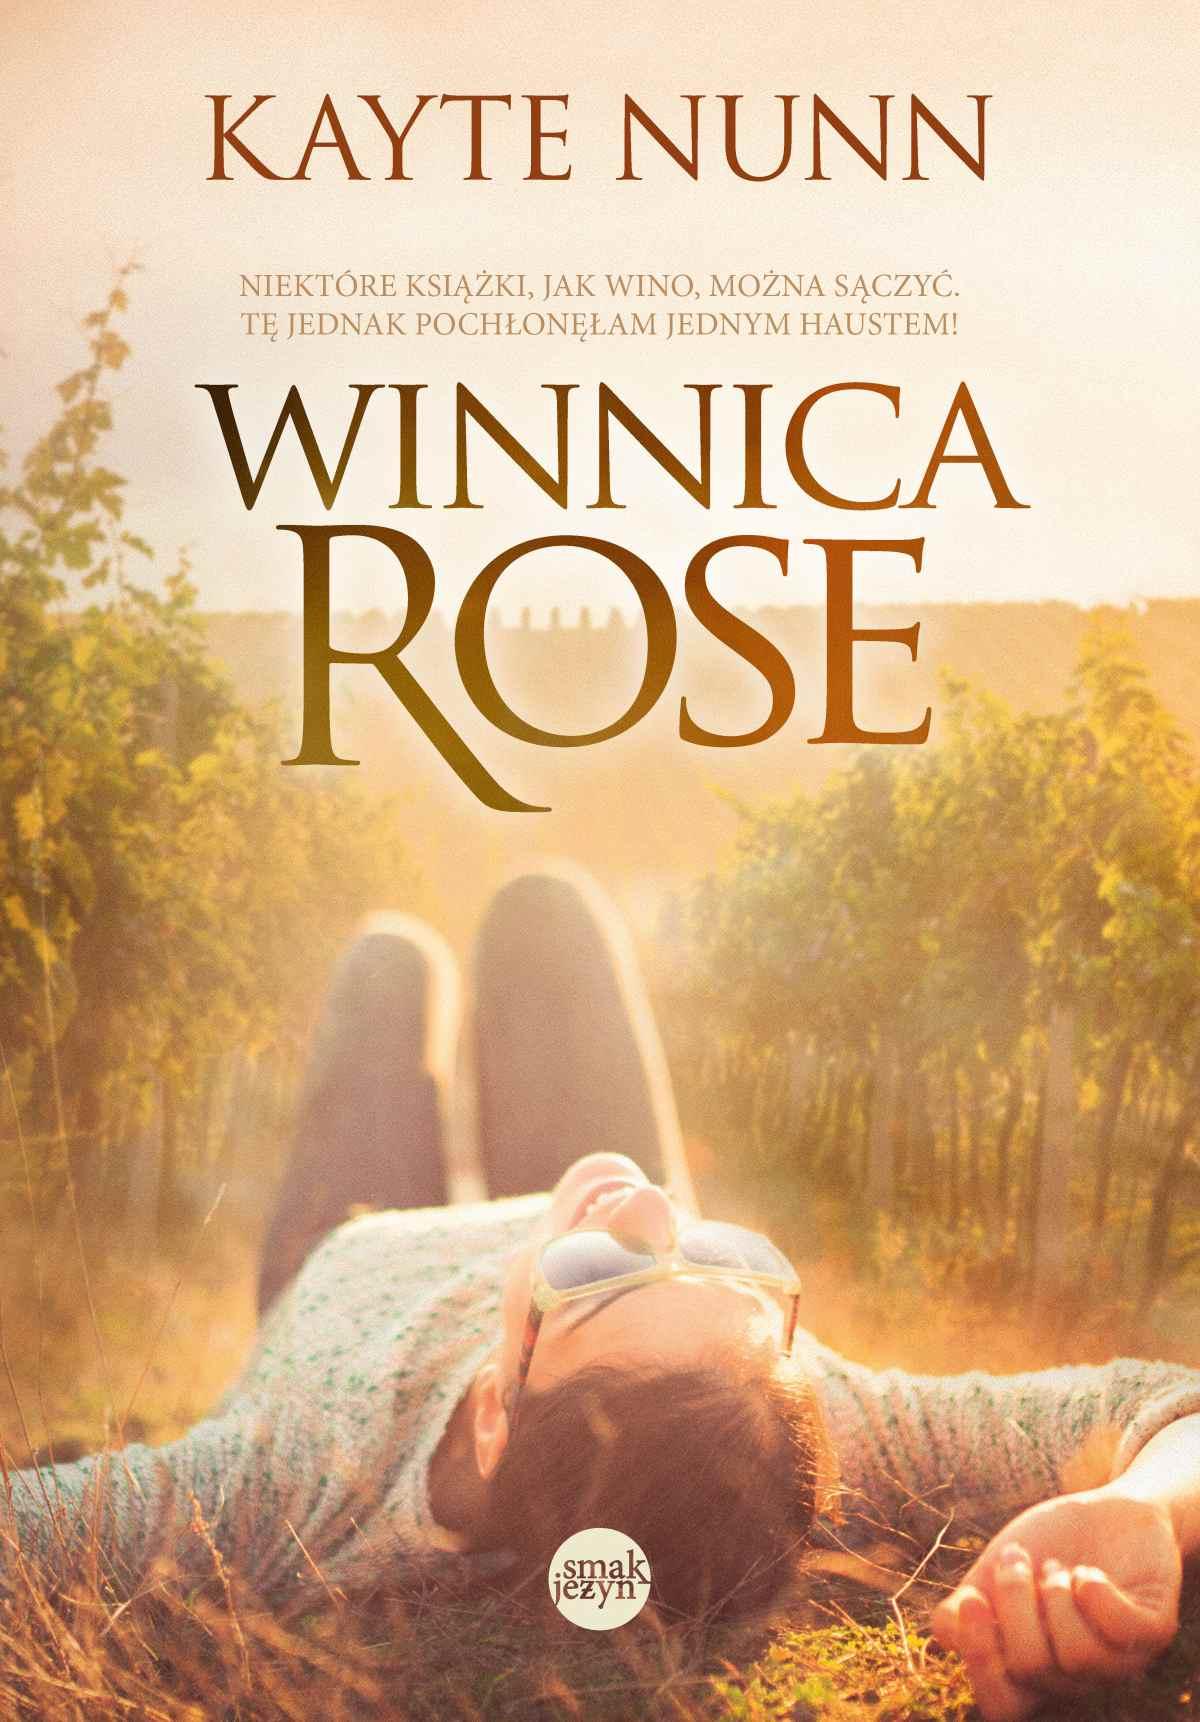 Winnica Rose - Ebook (Książka na Kindle) do pobrania w formacie MOBI